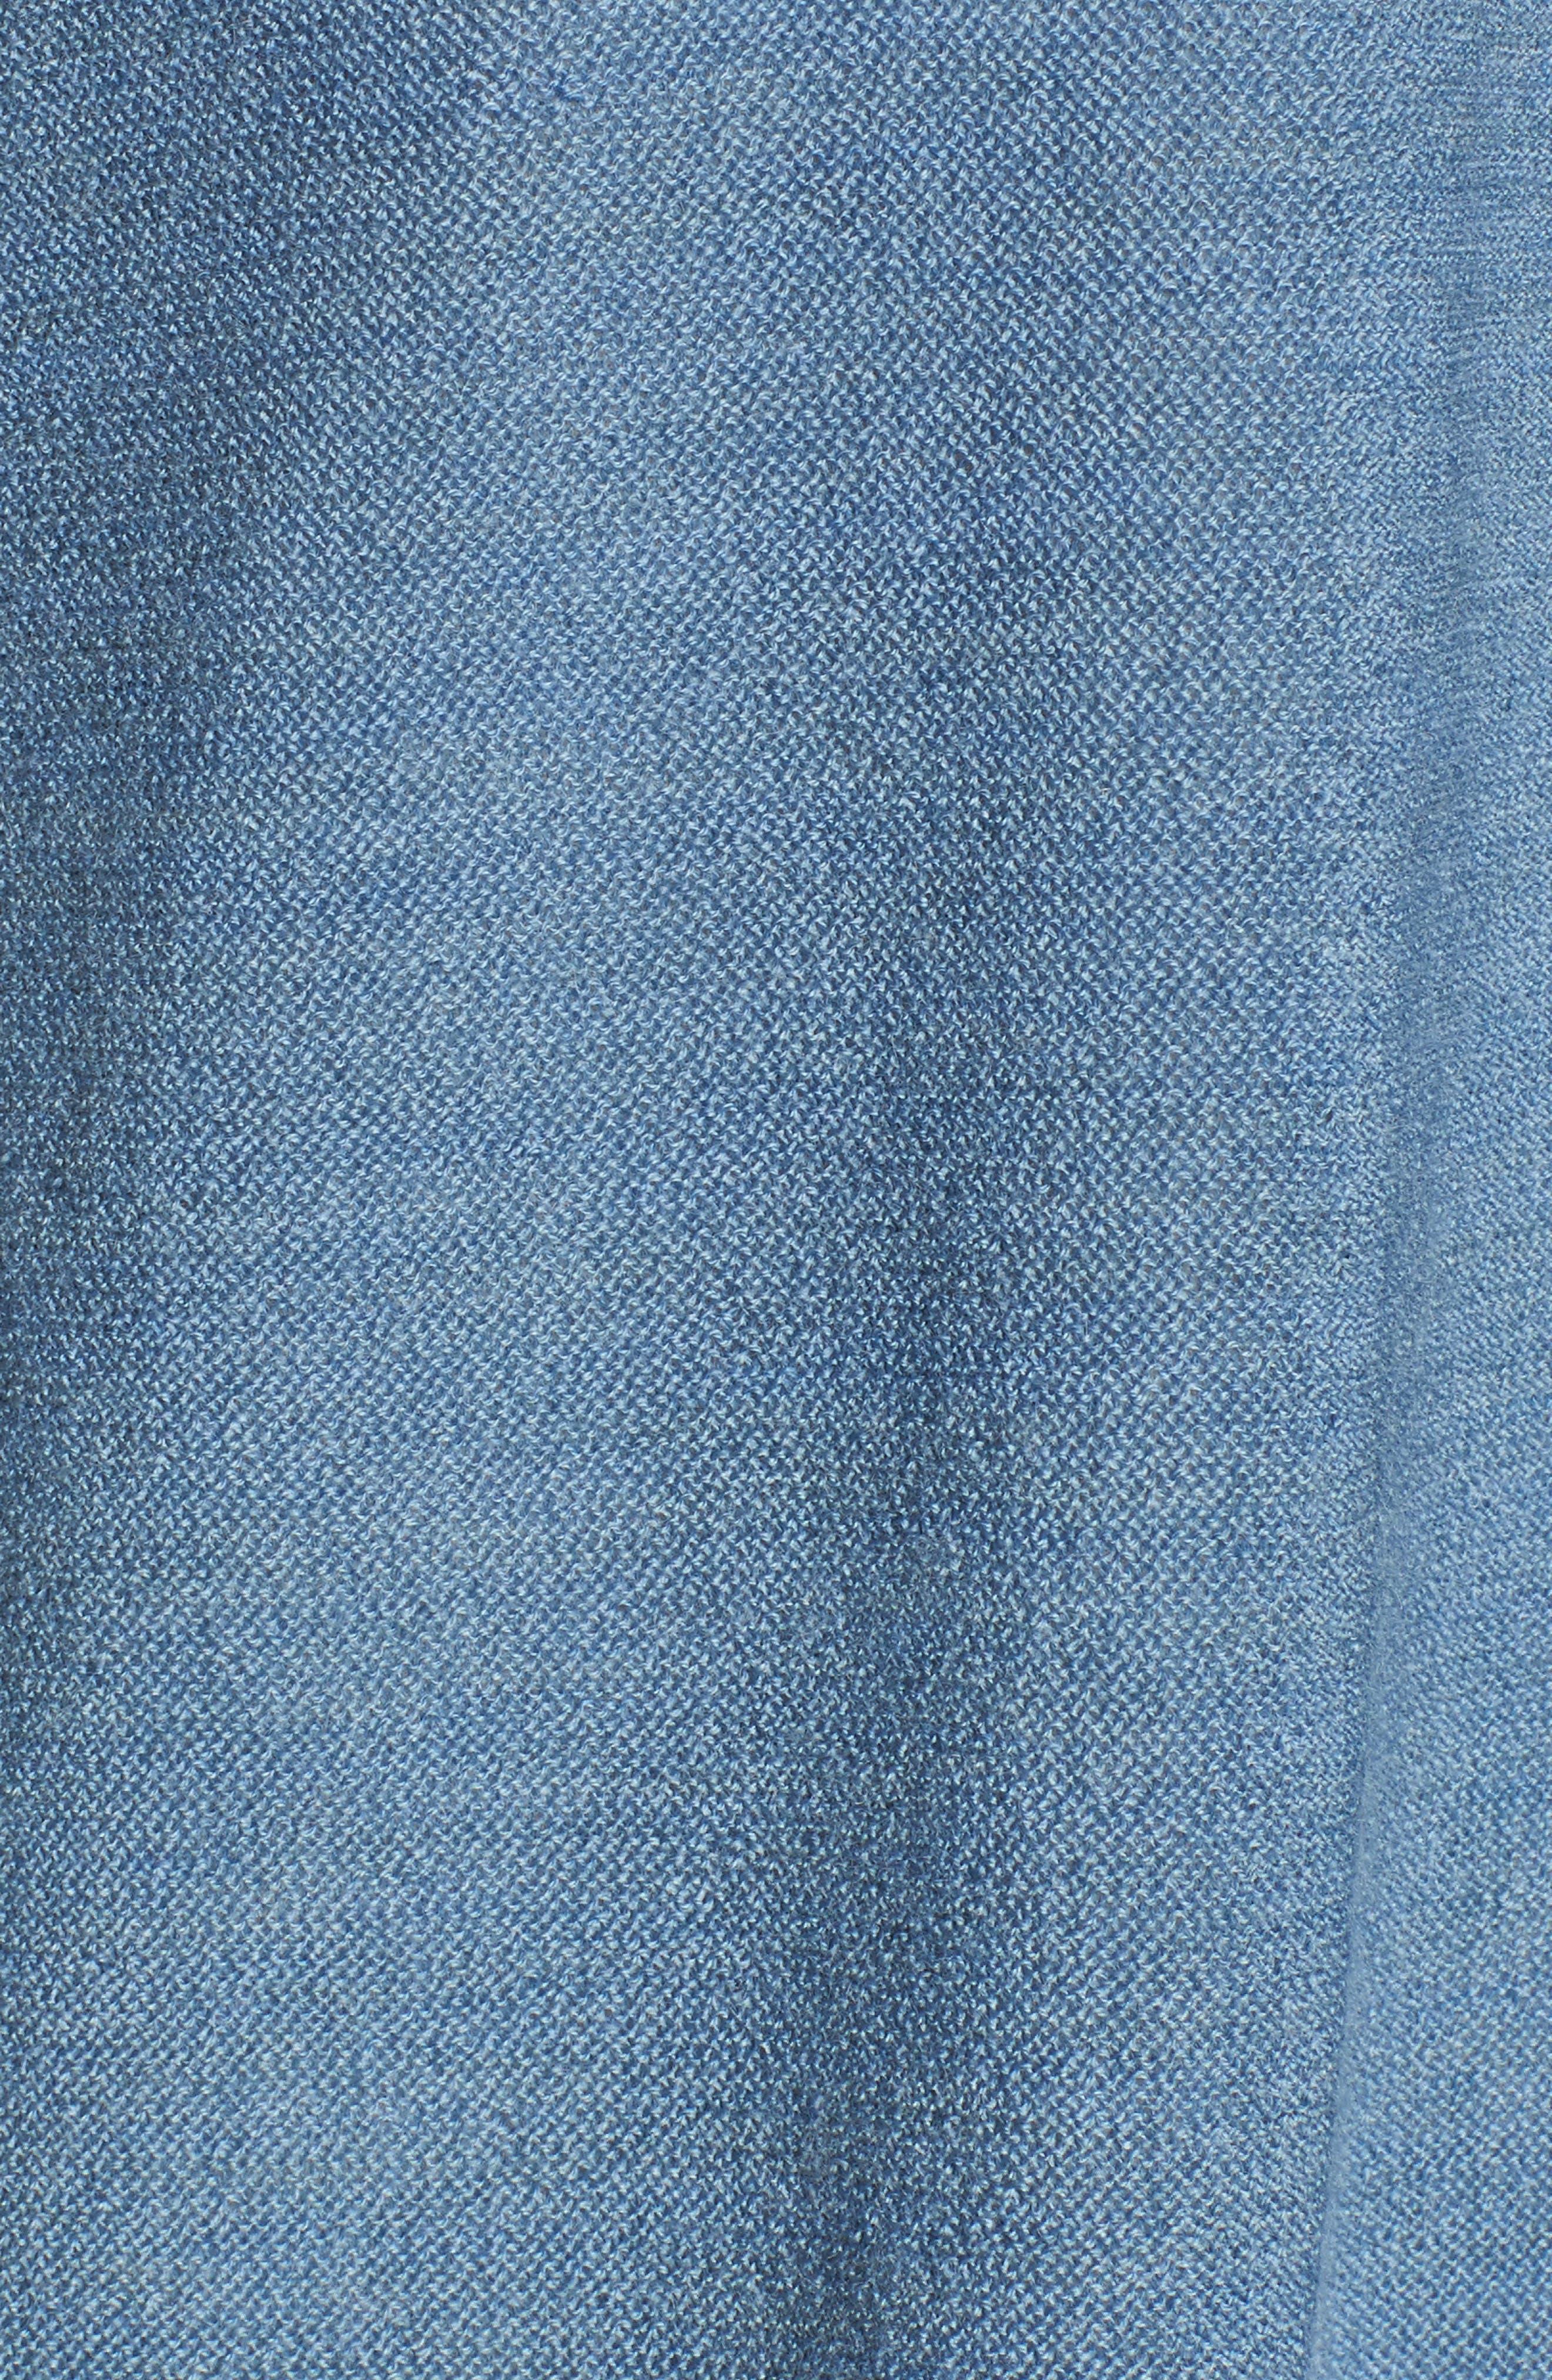 Merino Wool Sweater,                             Alternate thumbnail 20, color,